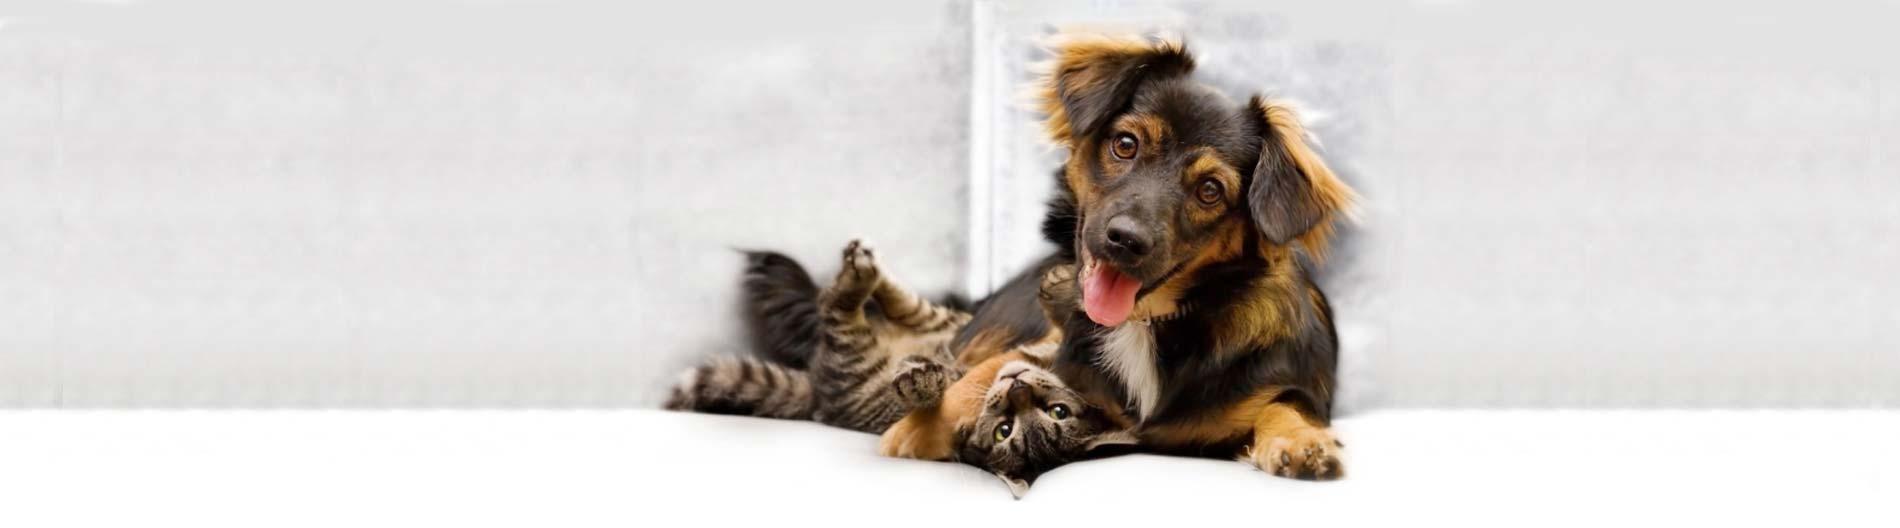 viagen-pets-dog and cat cloning